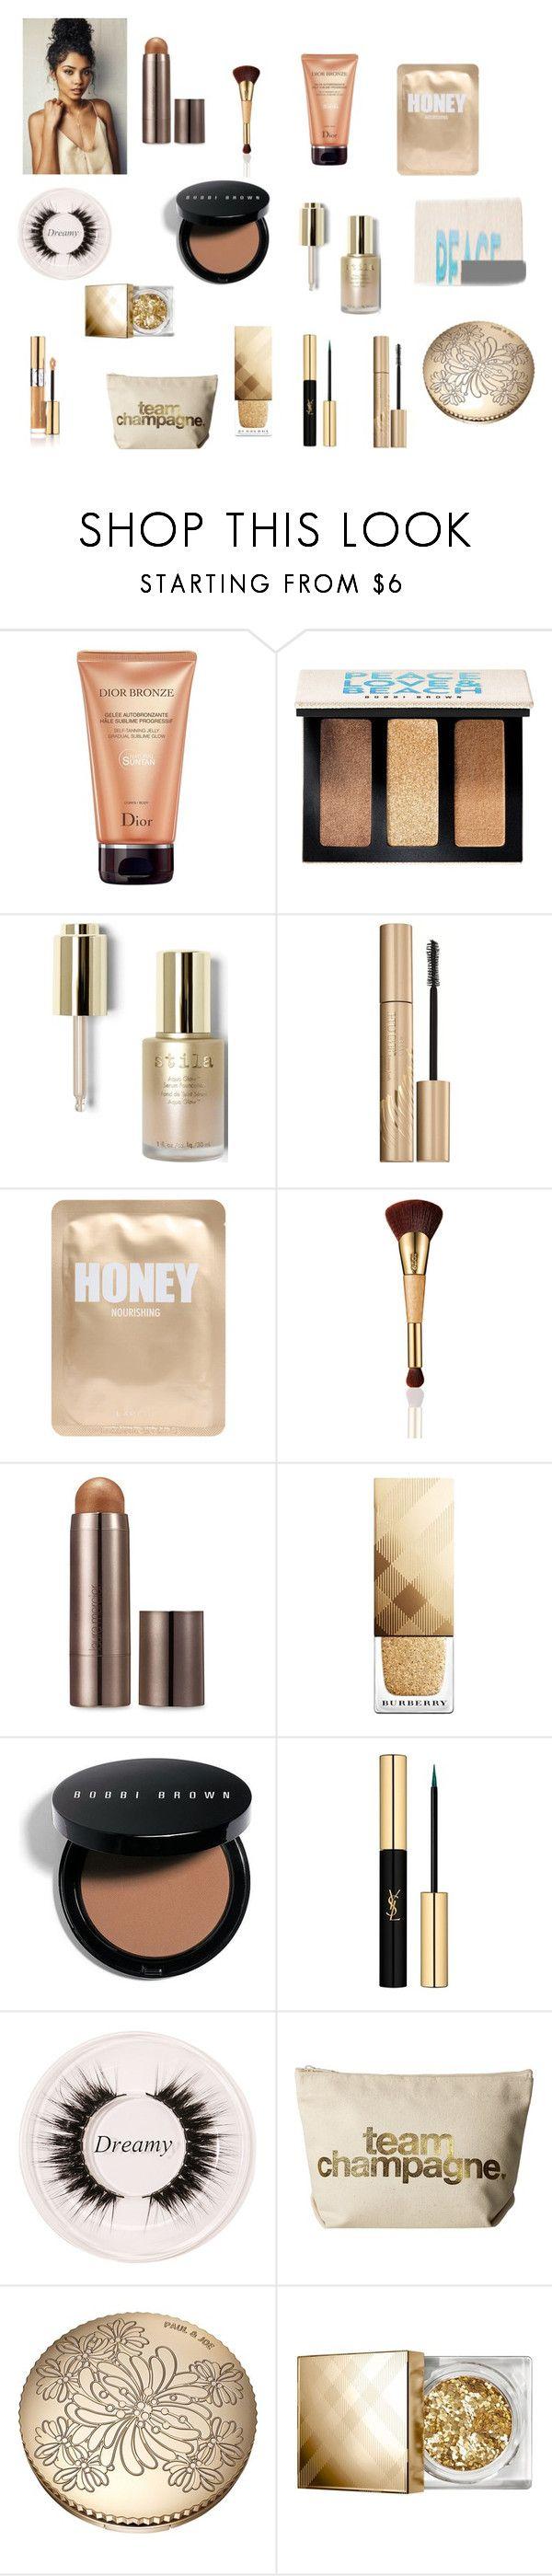 """Golden Lady"" by krystiab on Polyvore featuring beauty, Christian Dior, Bobbi Brown Cosmetics, Stila, Lapcos, tarte, Laura Mercier, Burberry, Yves Saint Laurent and Certifeye"